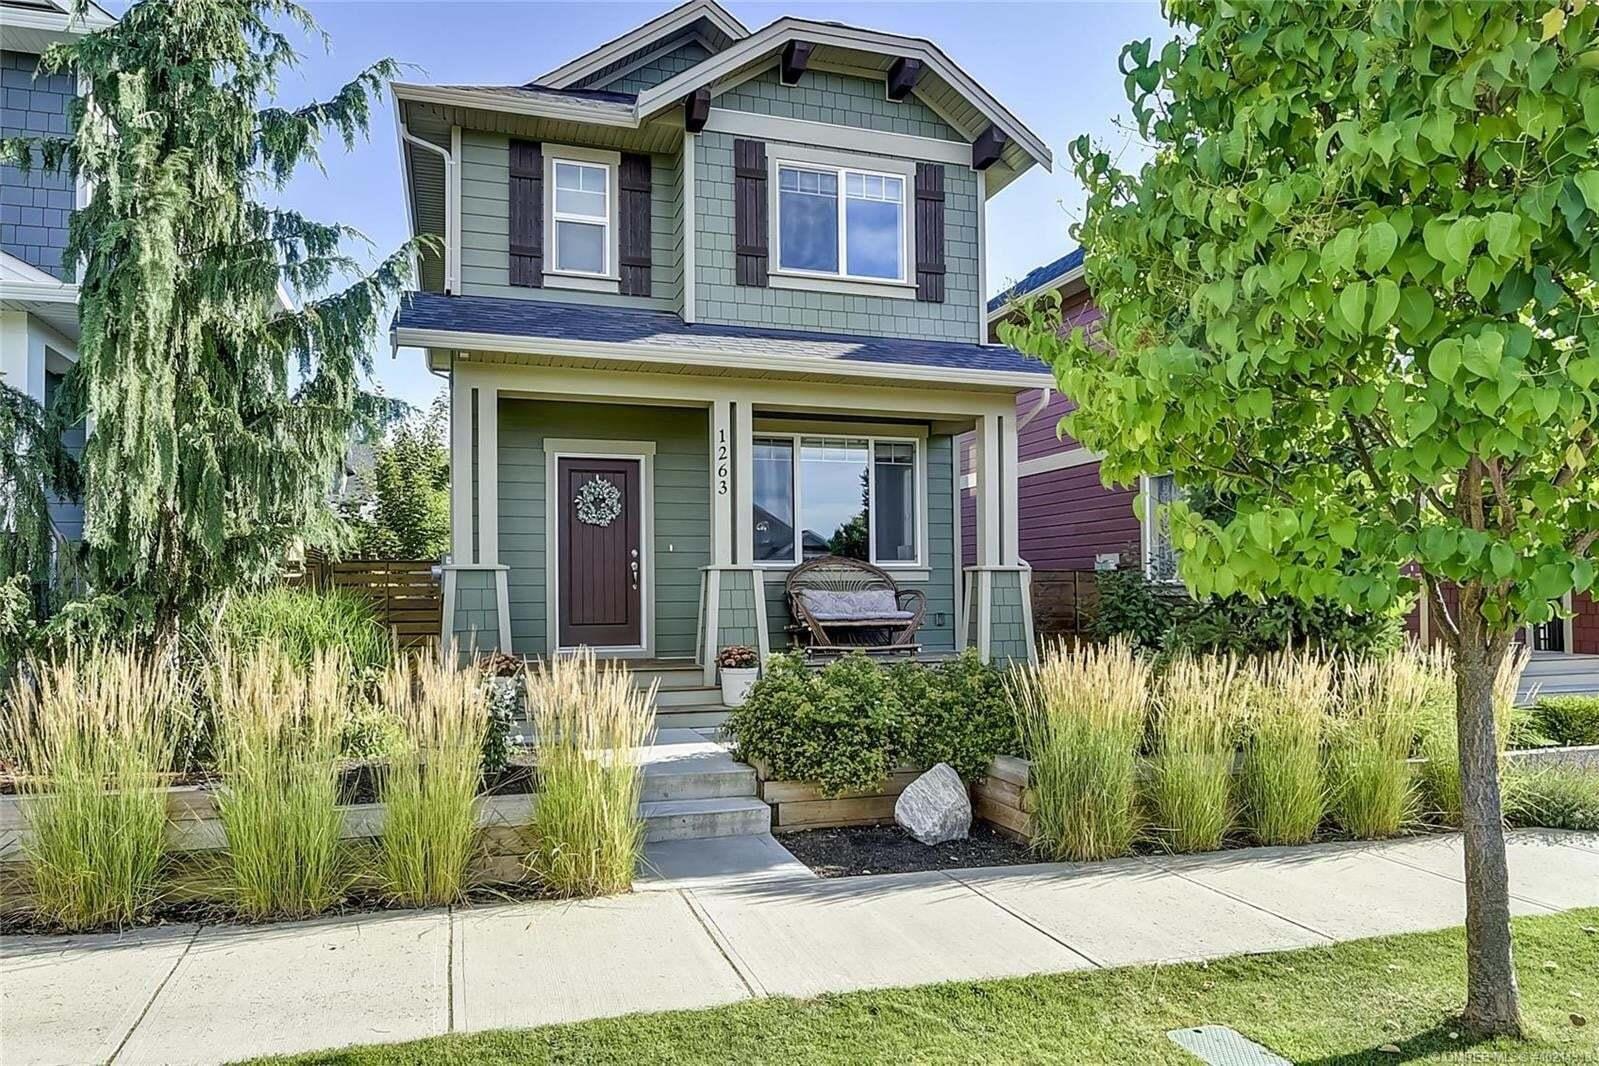 House for sale at 1263 Steele Rd Kelowna British Columbia - MLS: 10214313